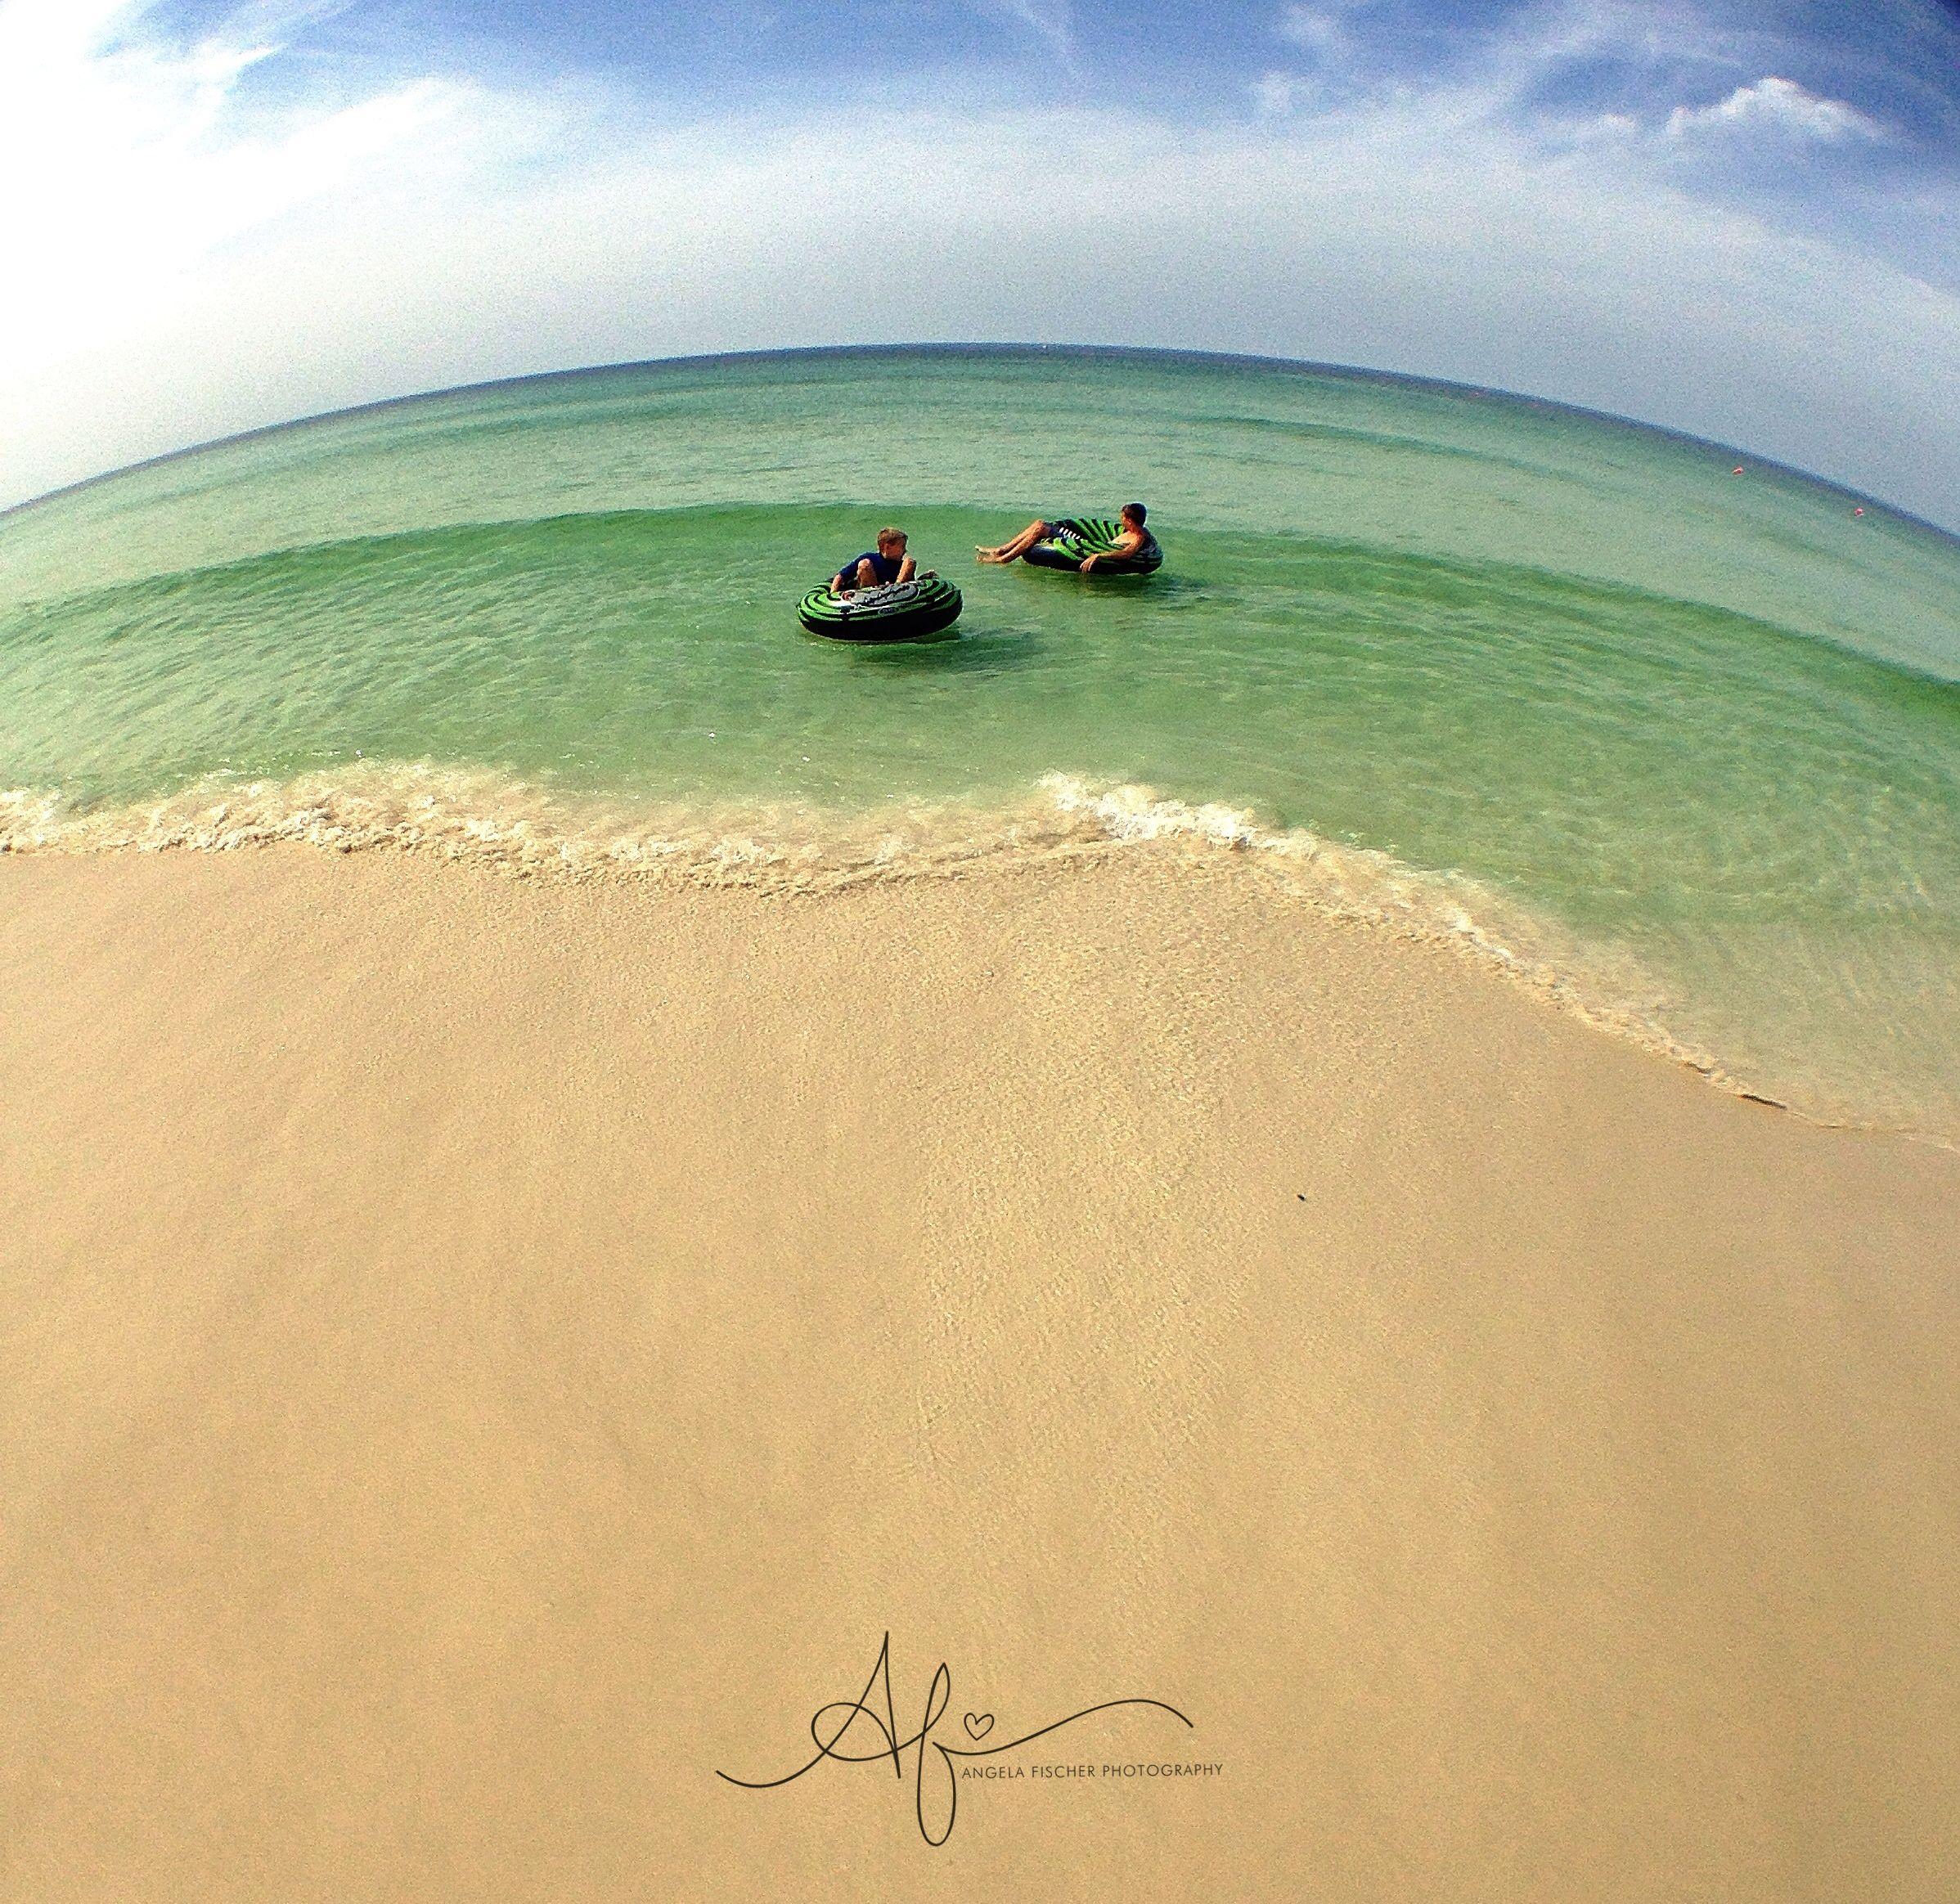 On top of the world! #summer #beachphotography #angelafischerphoto